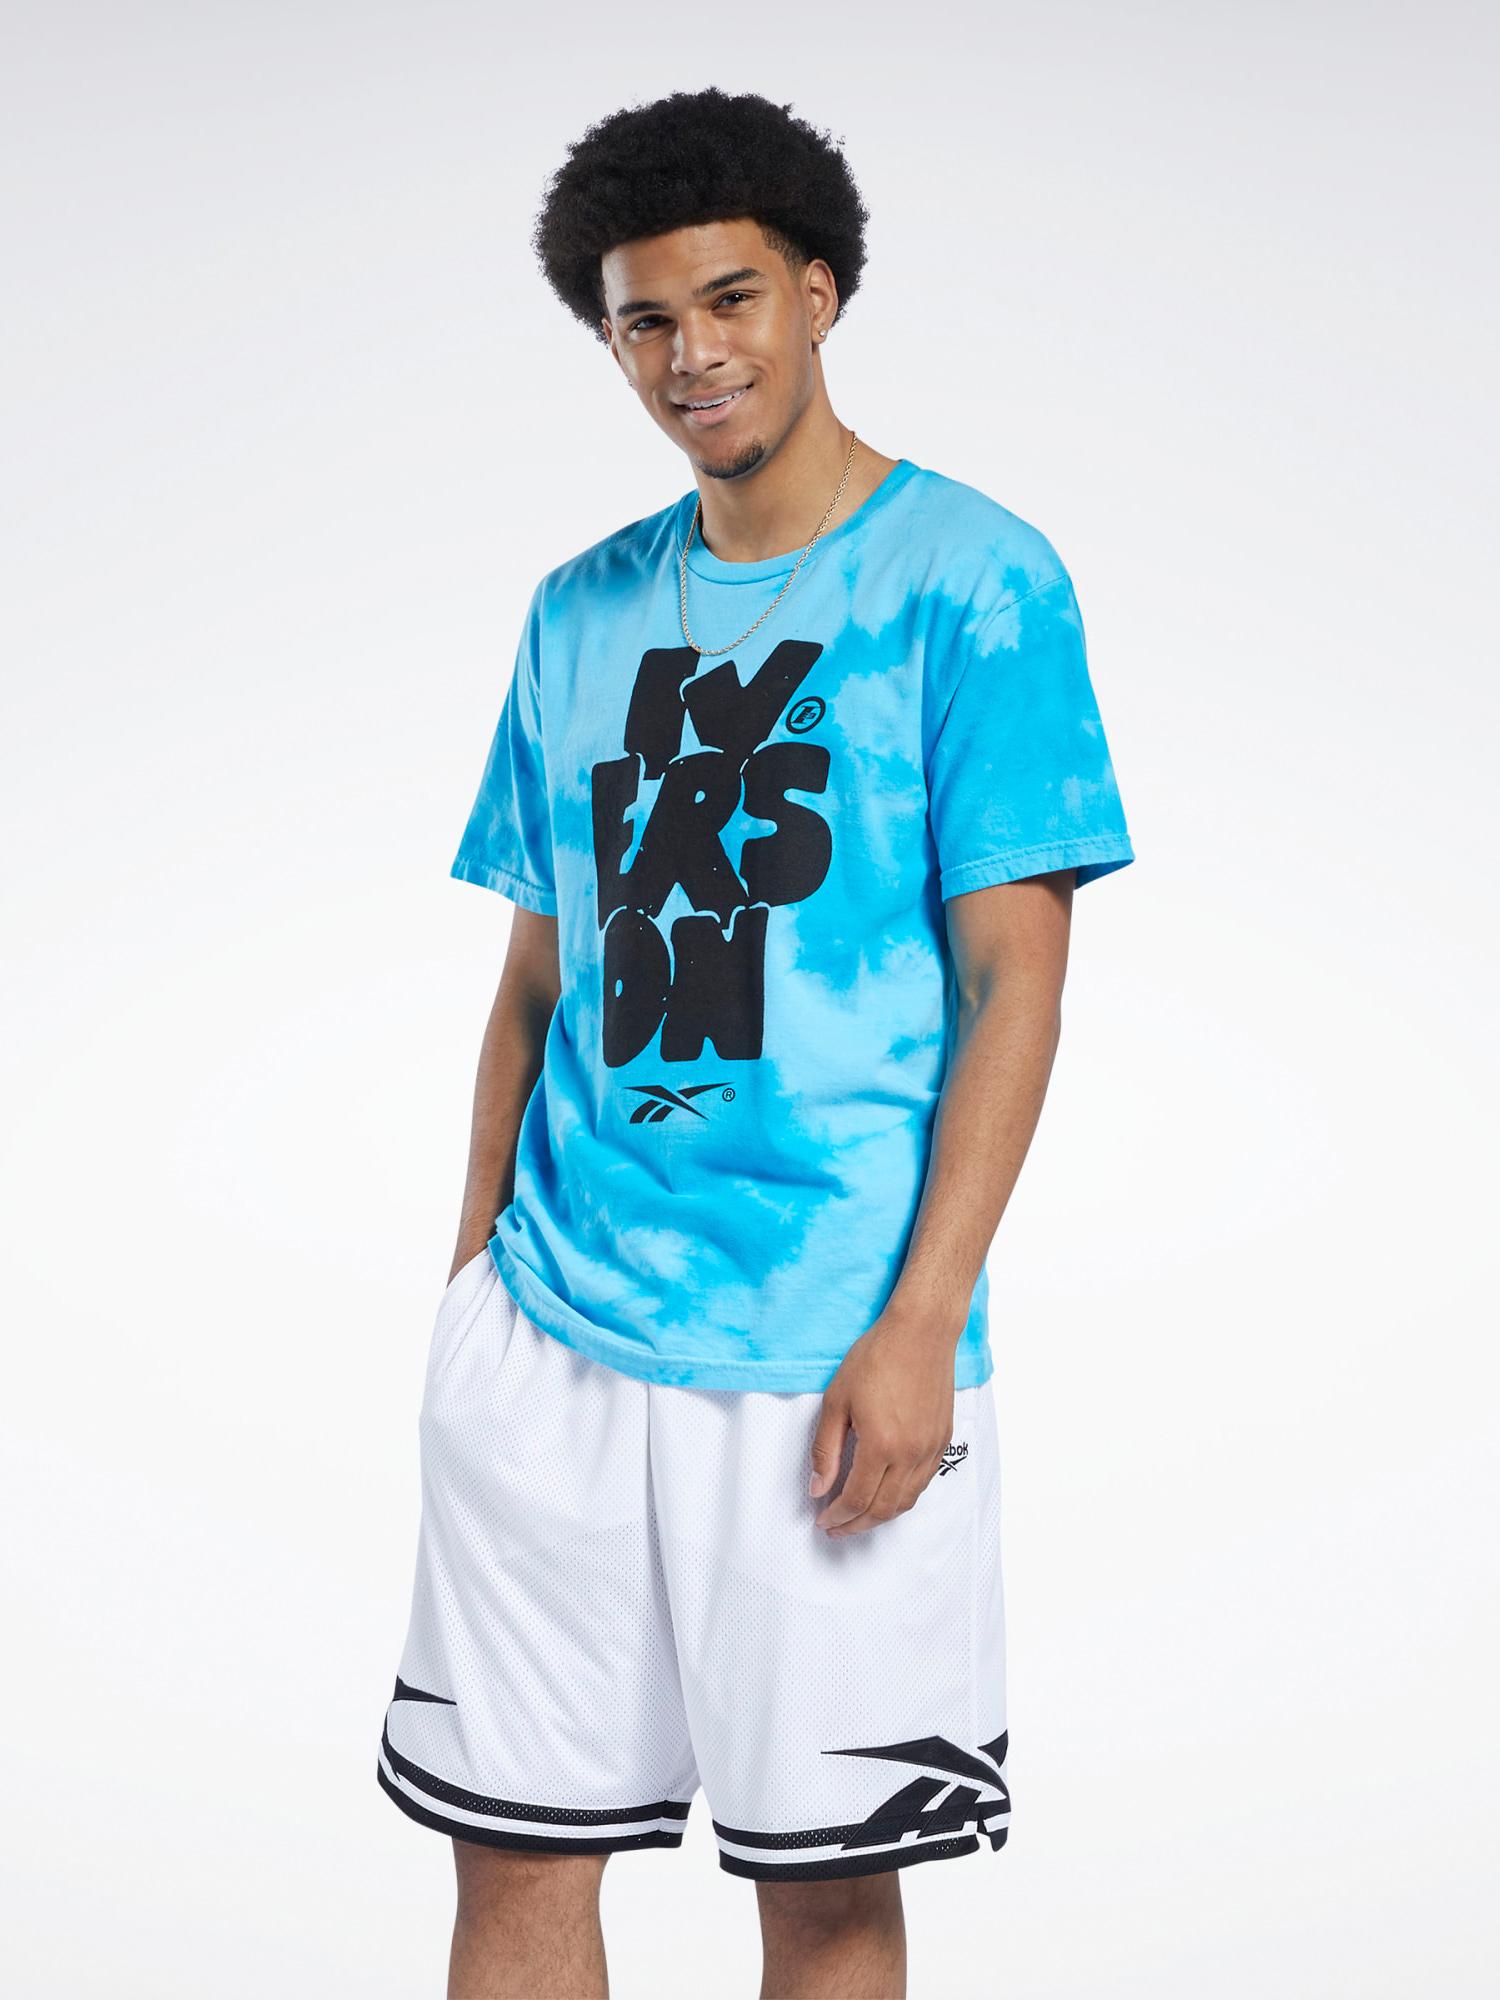 reebok-question-iverson-blue-shirt